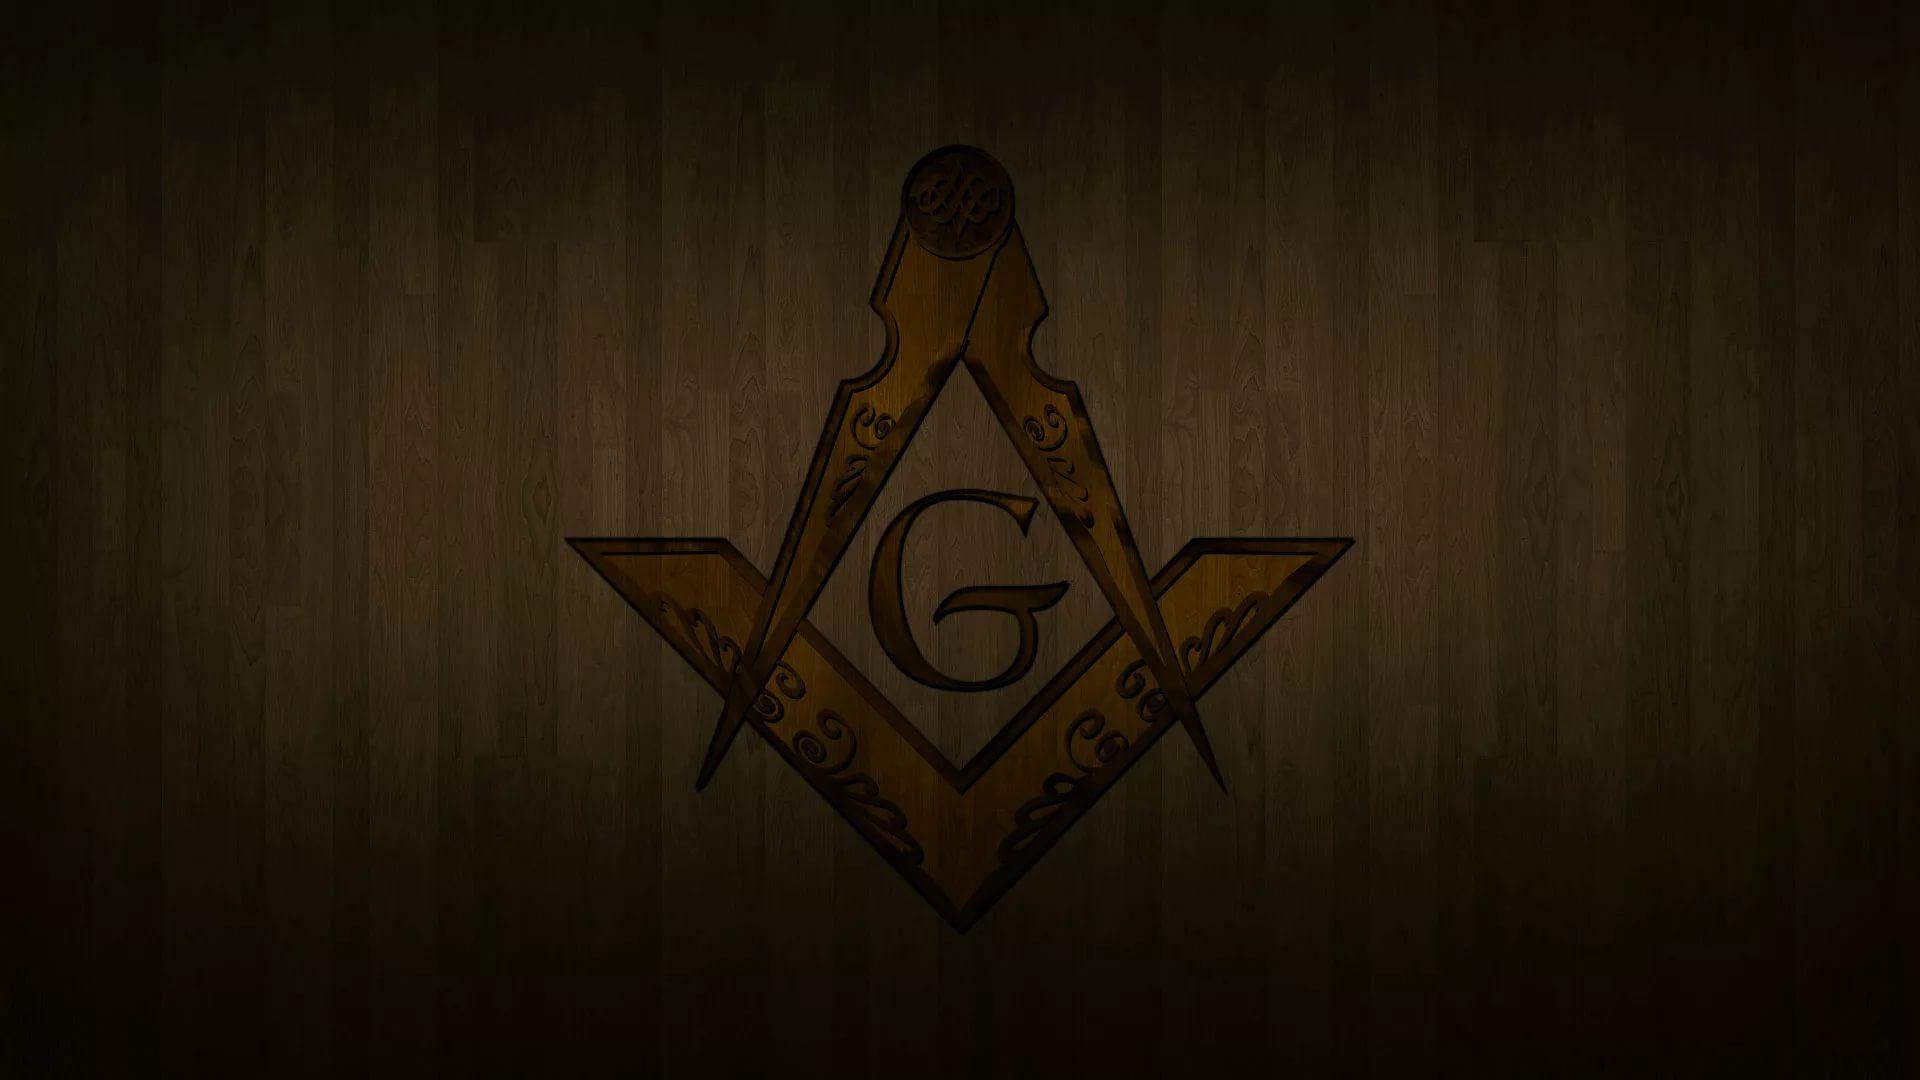 Freemason pc wallpaper